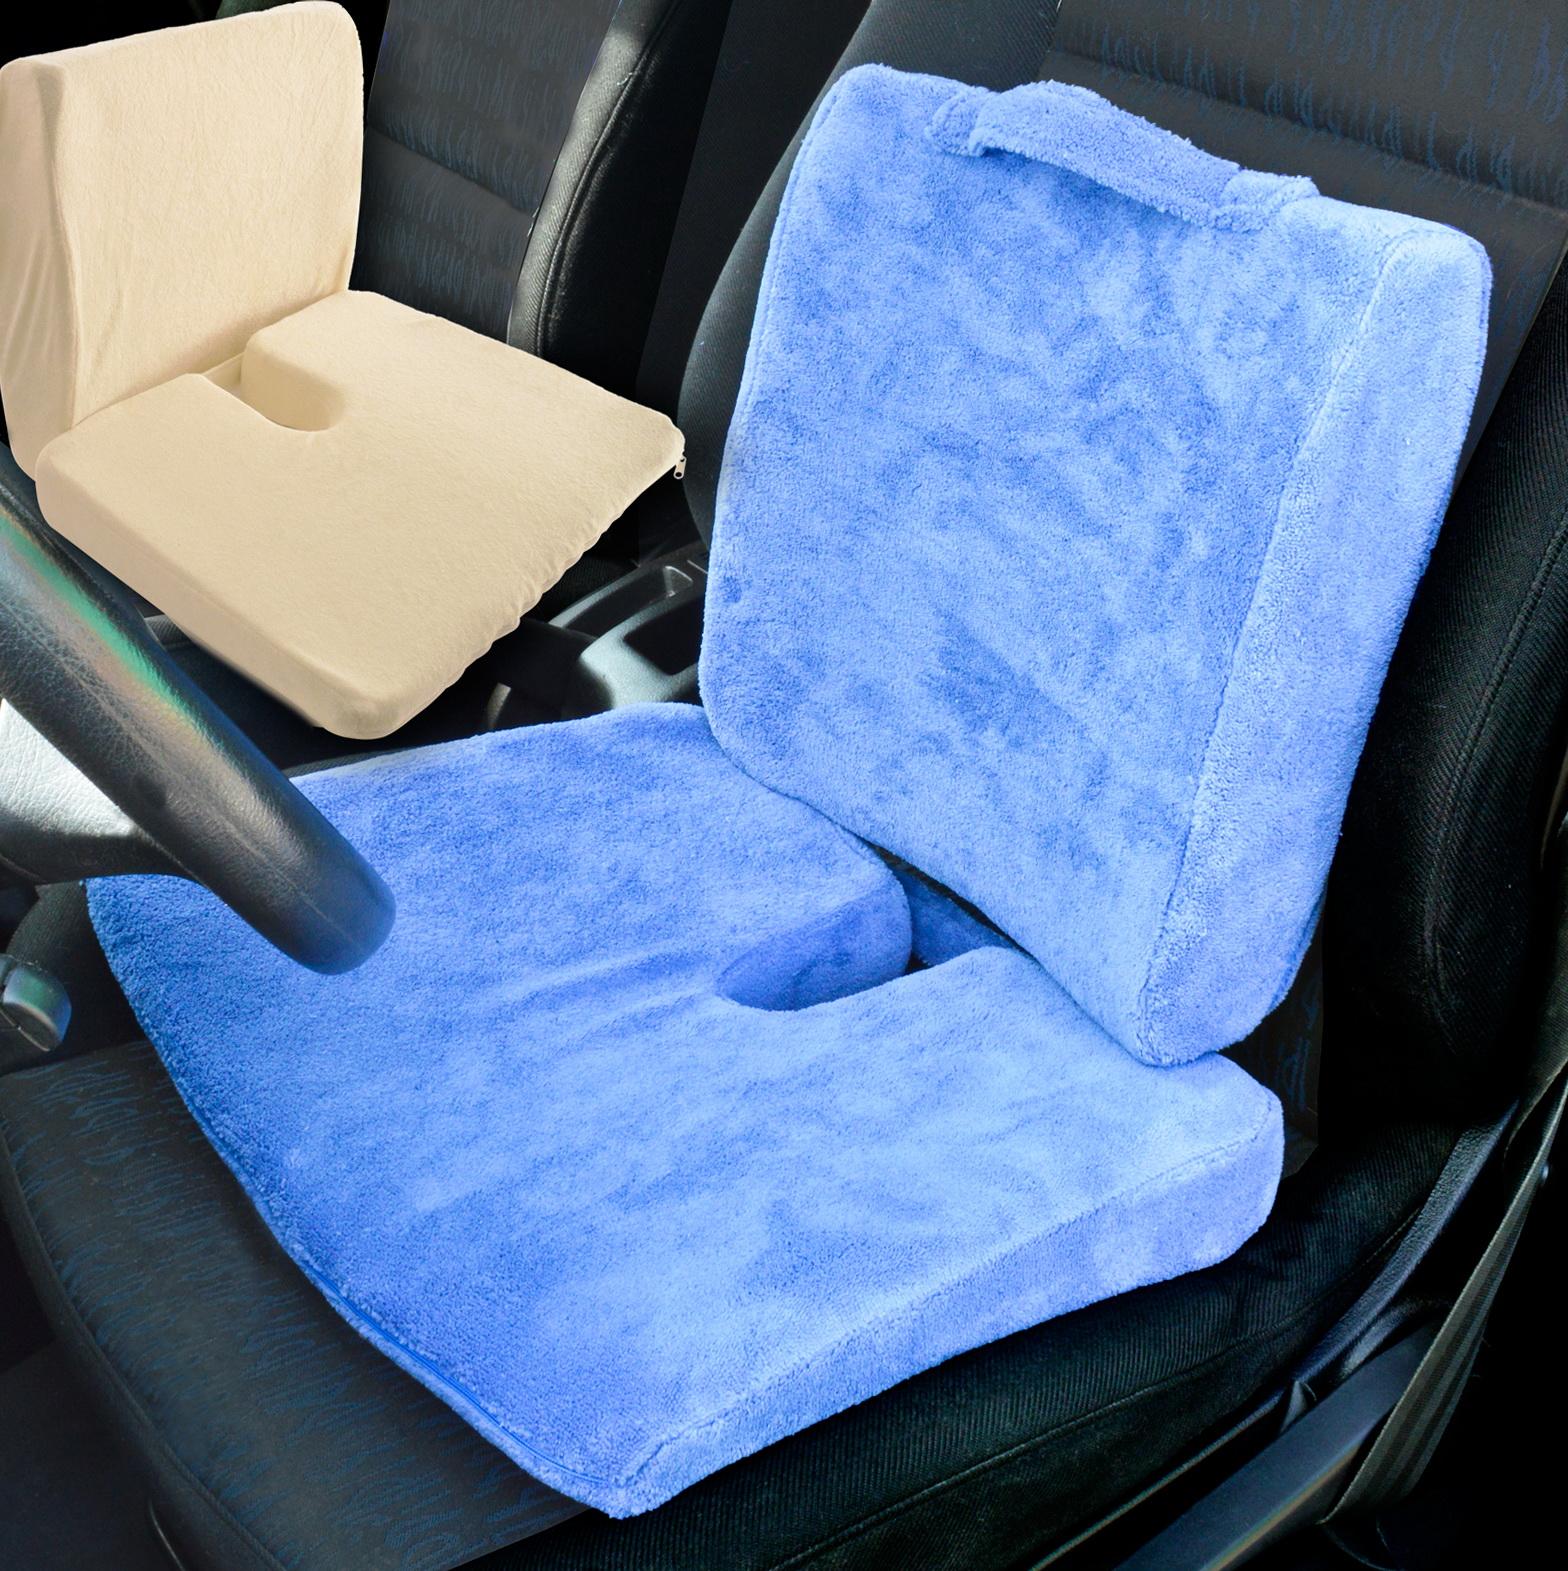 Orthopedic Seat Cushion For Sciatica